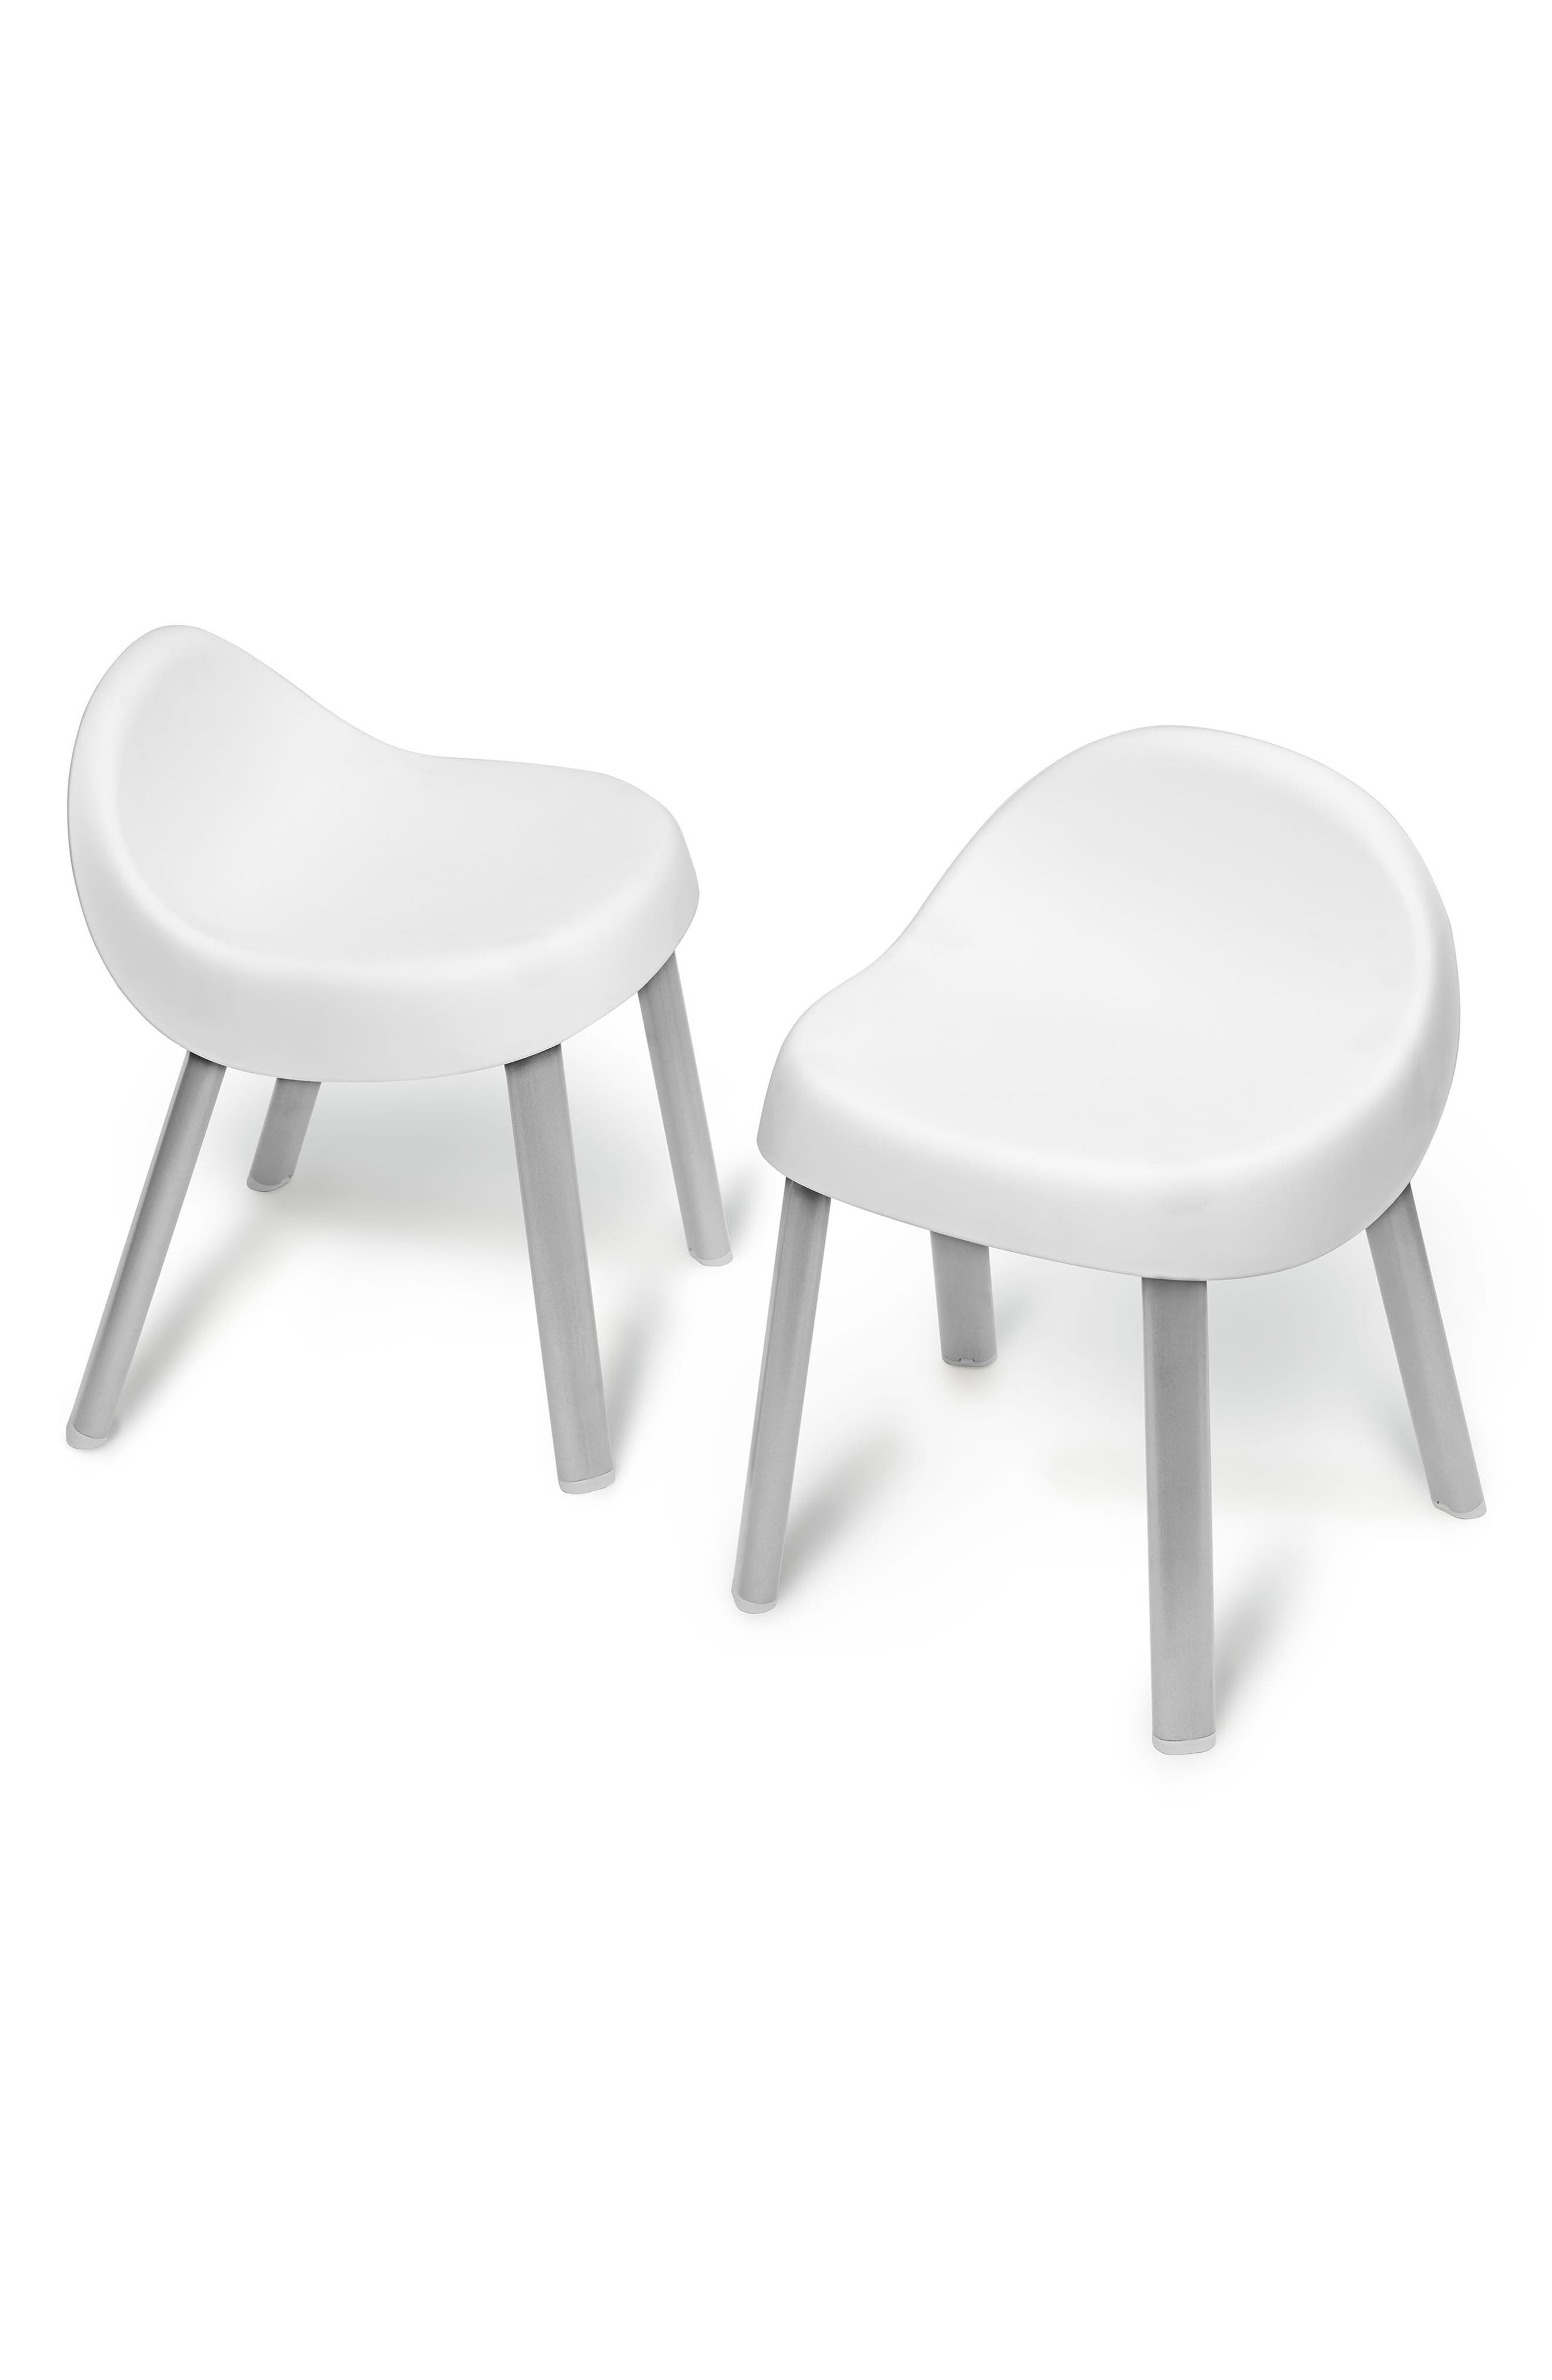 Explore & More Kids' Chairs,                             Main thumbnail 1, color,                             WHITE